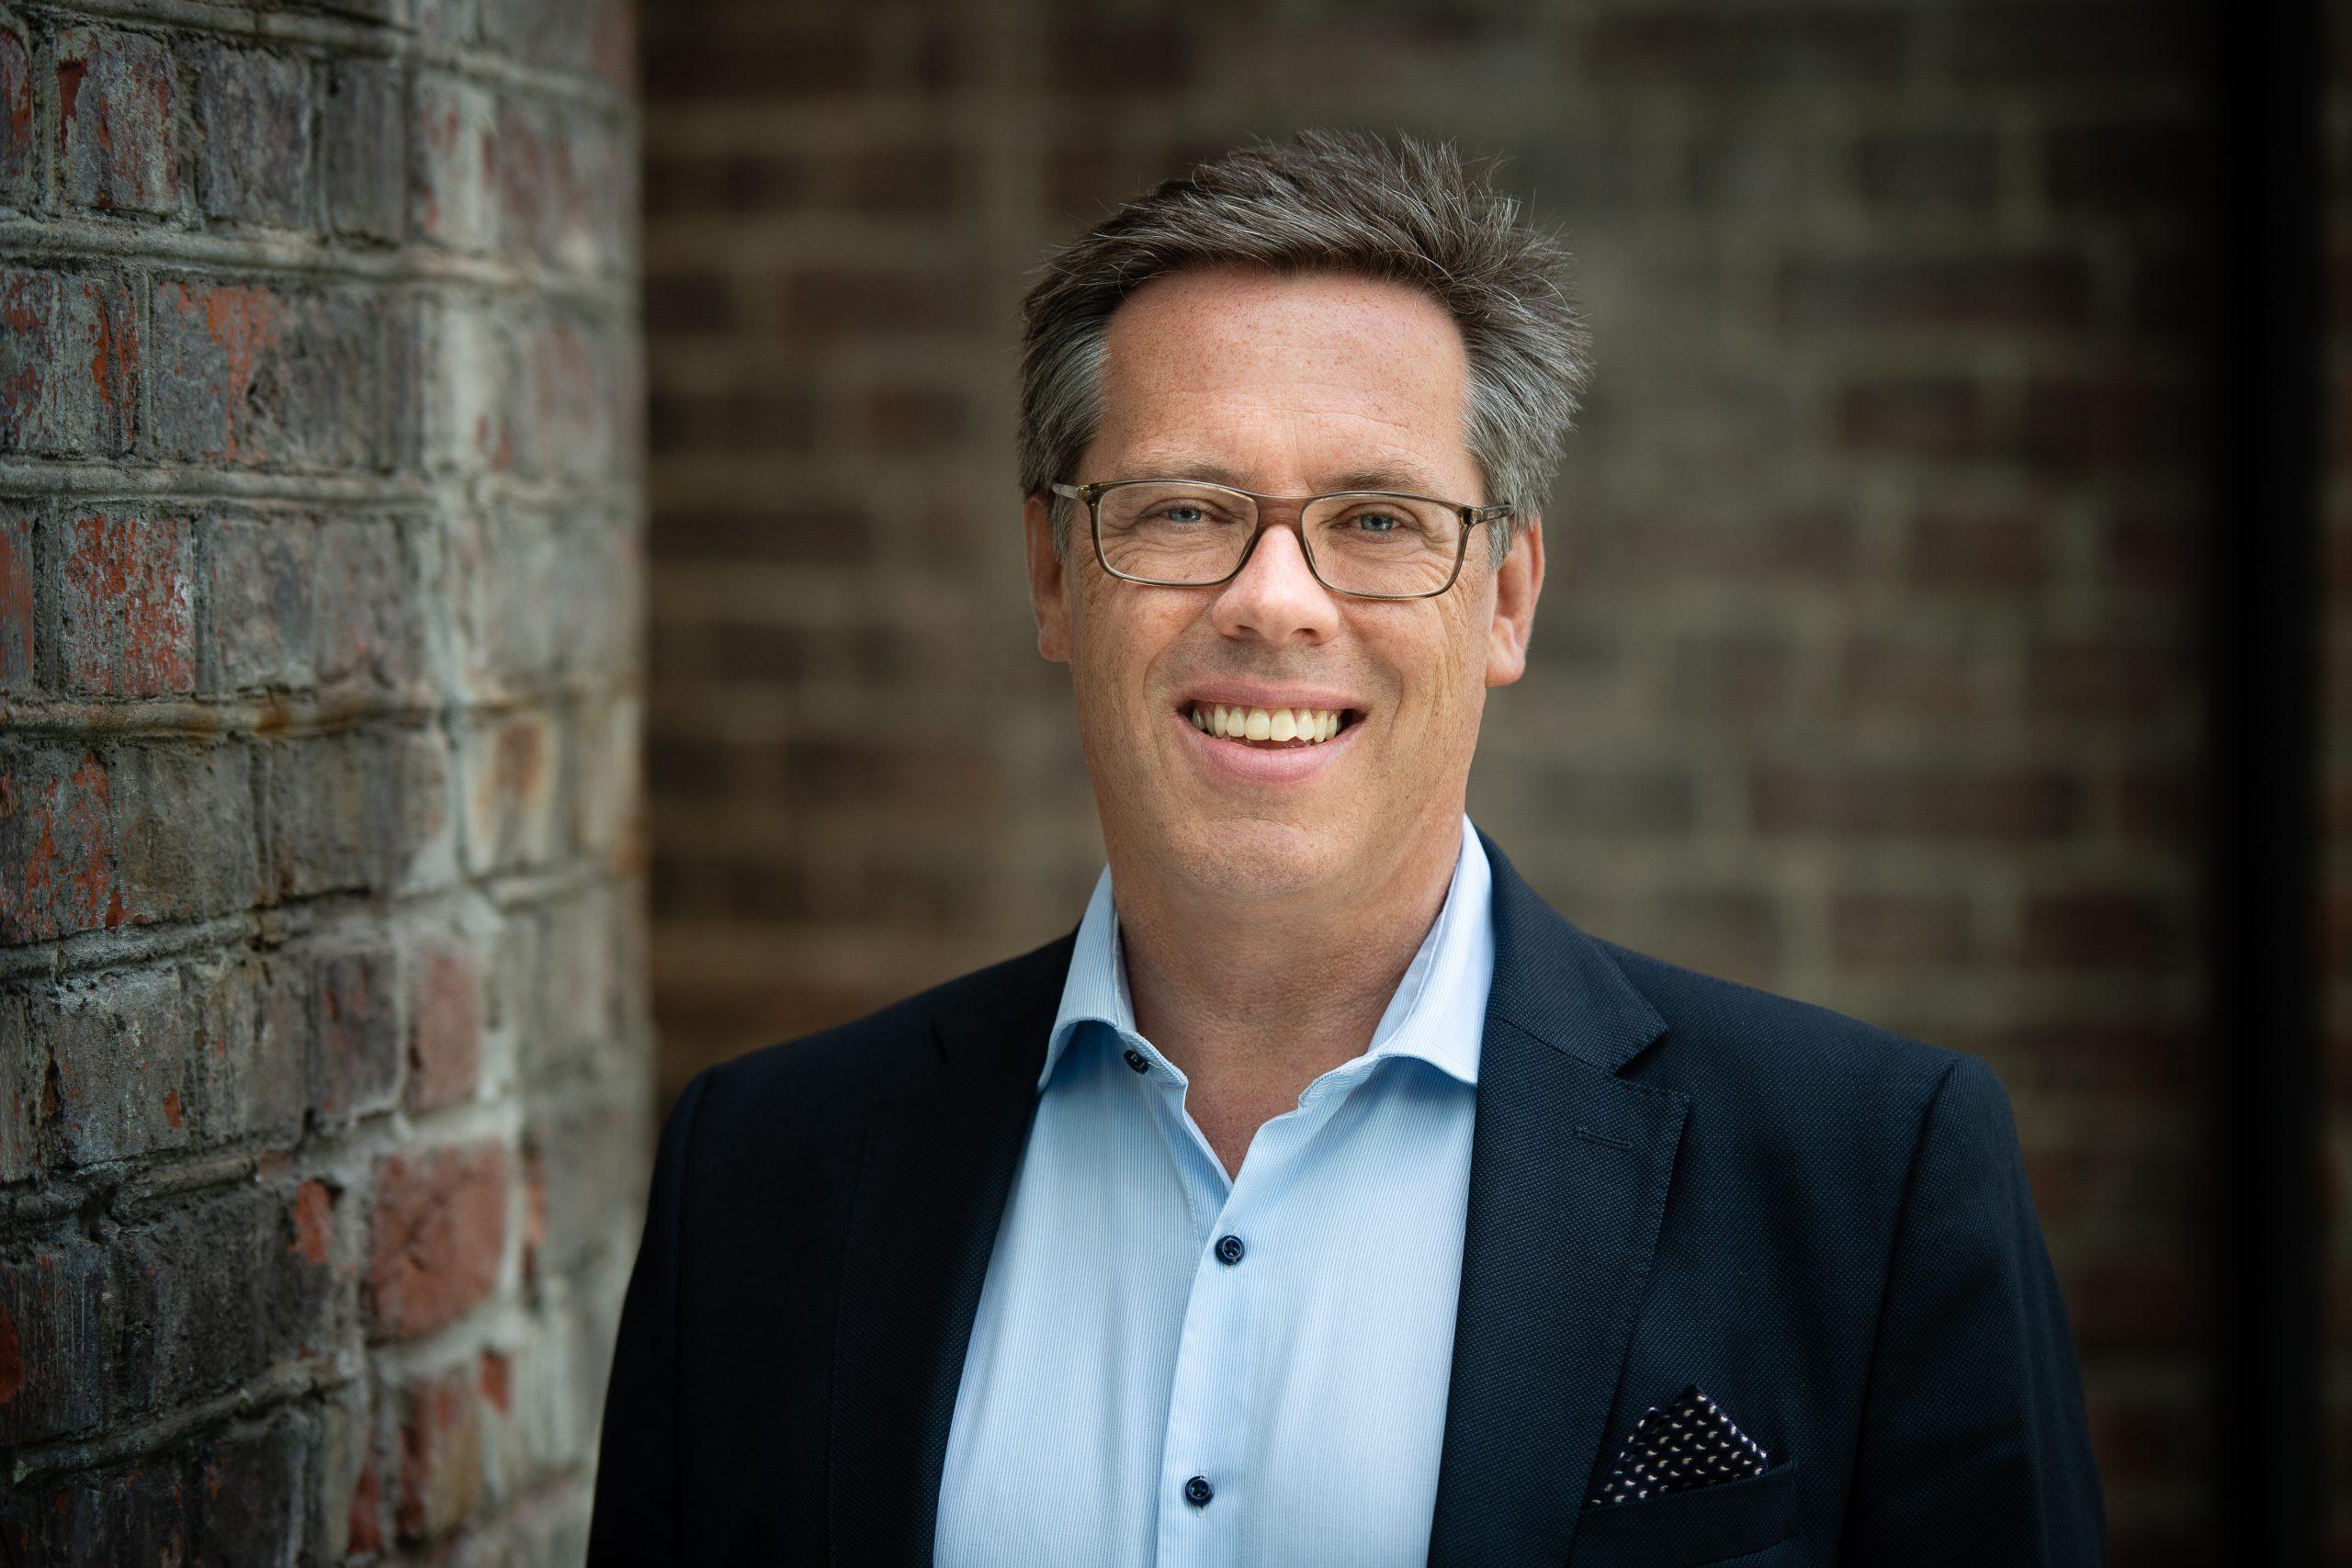 Morten Gundersen, DKEU